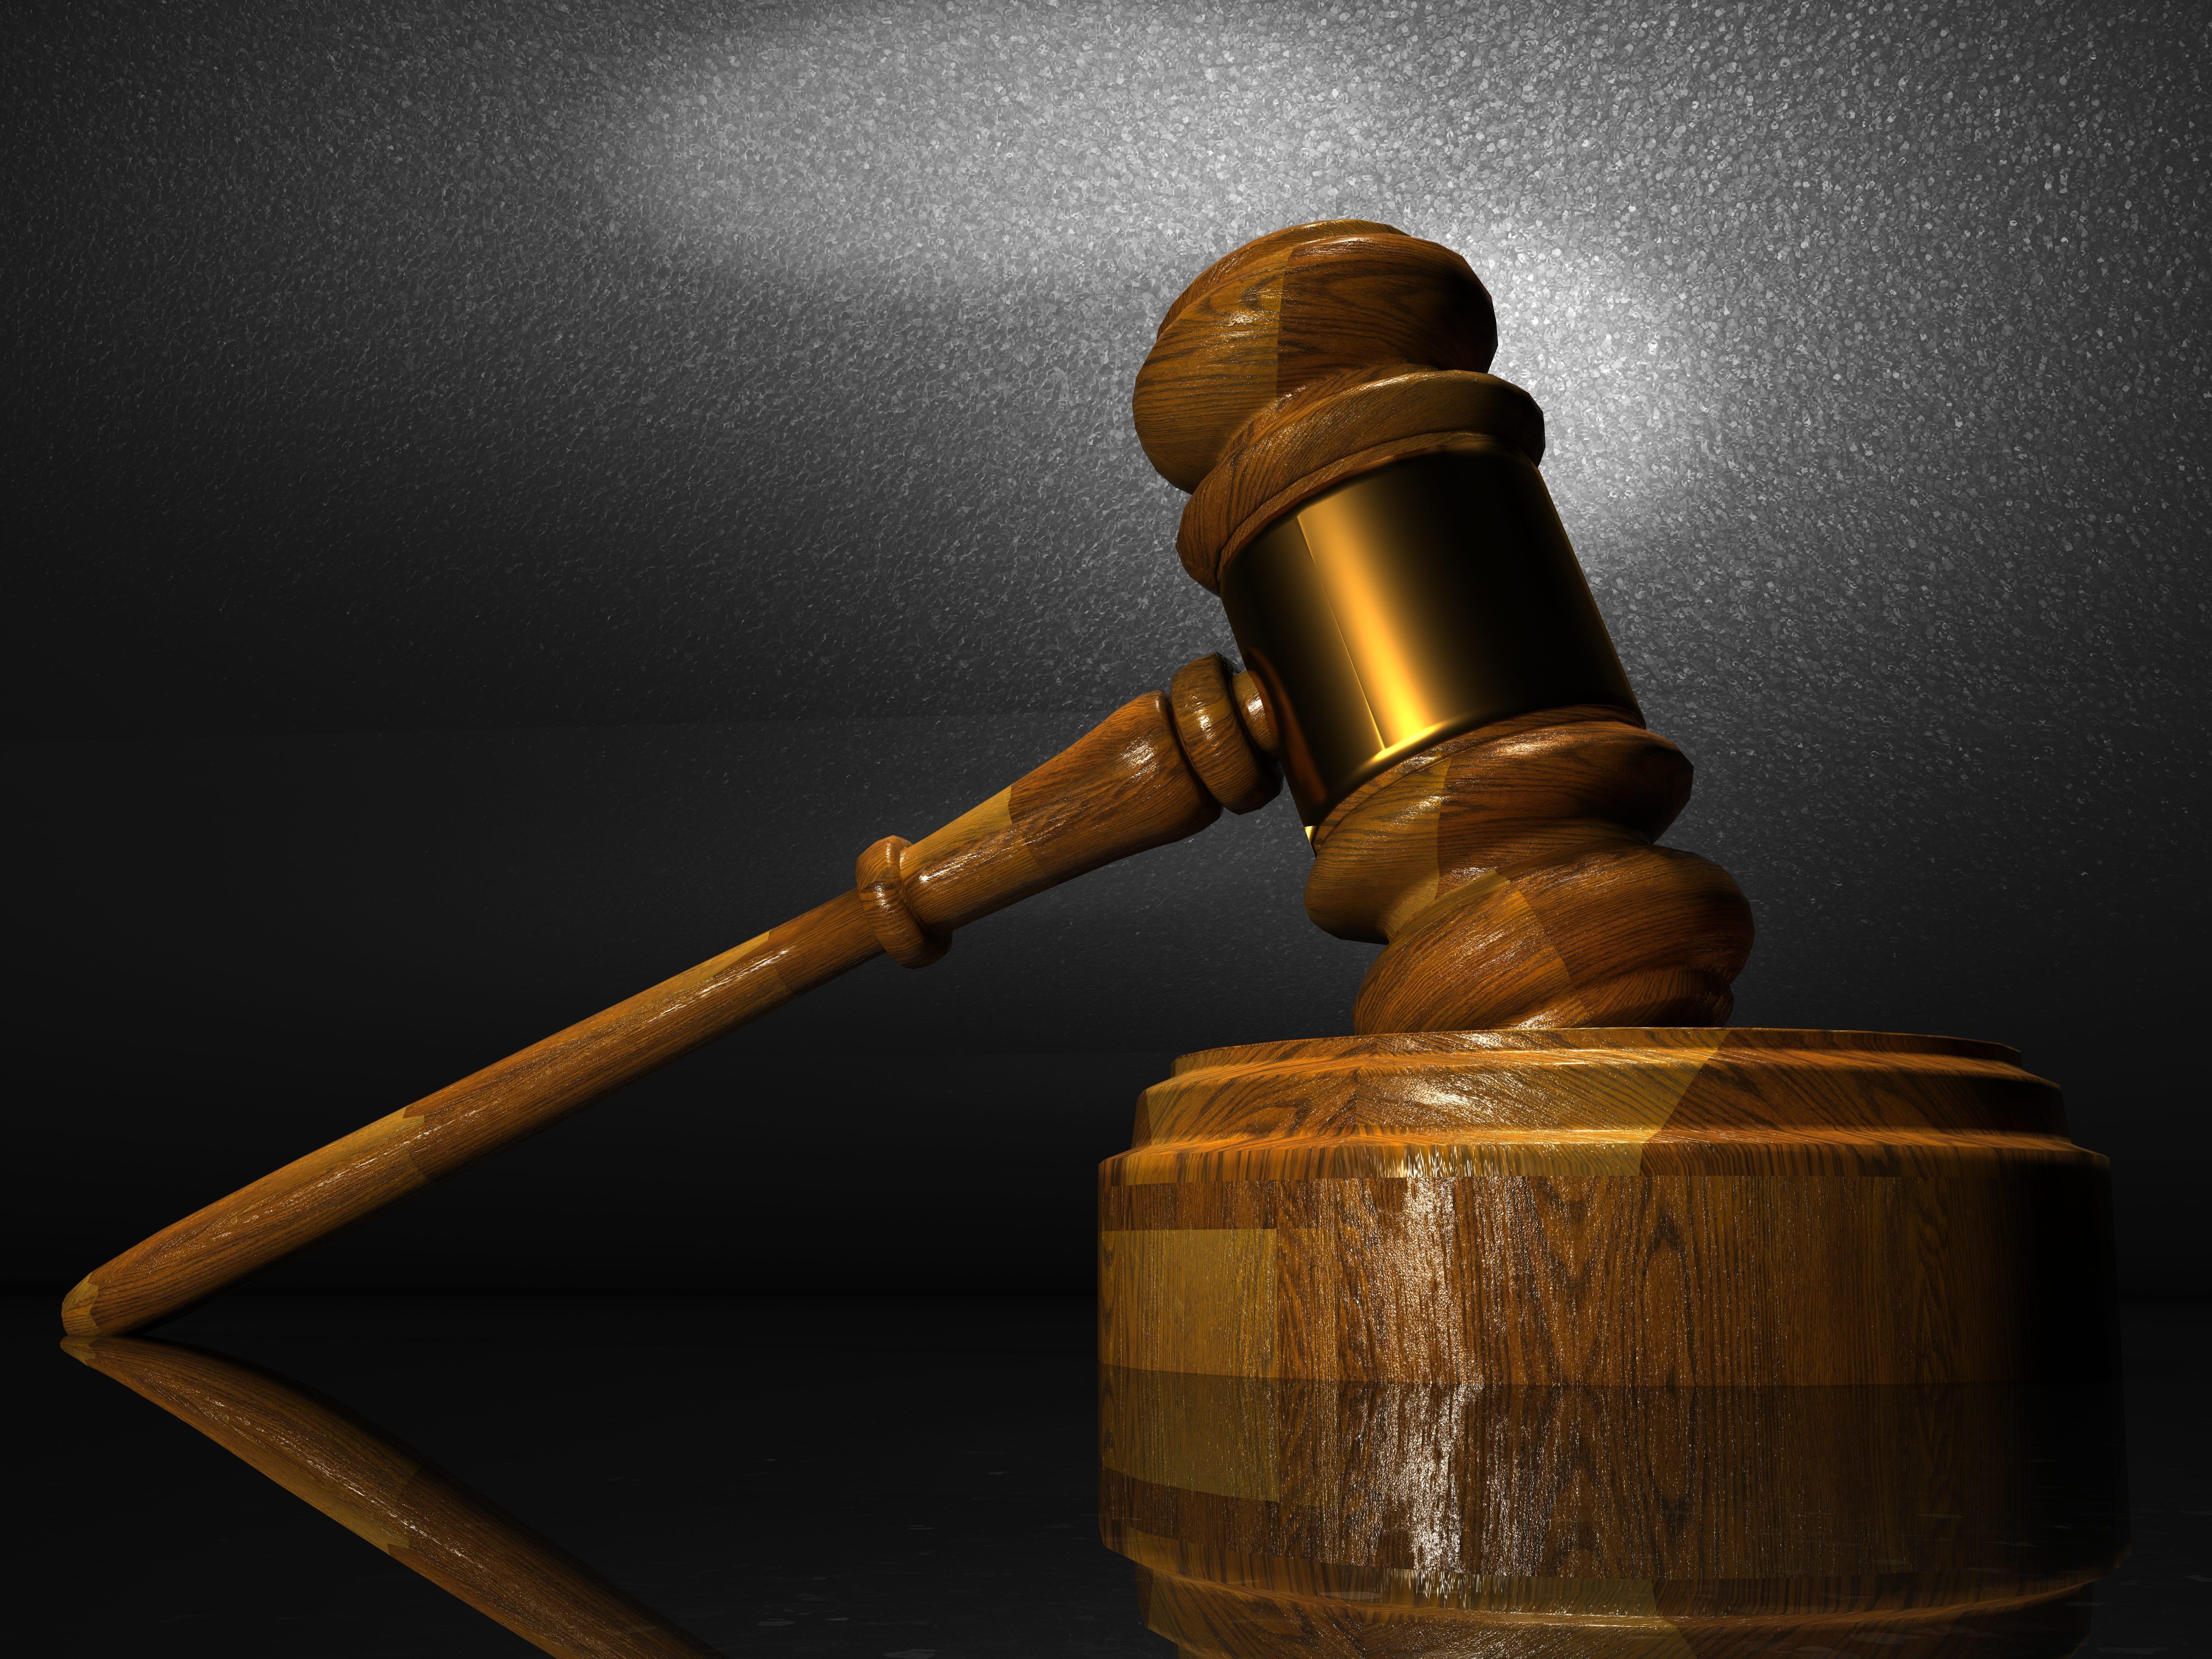 Brown Mallet Law Justice Court Judge Legal Lawyer Crime